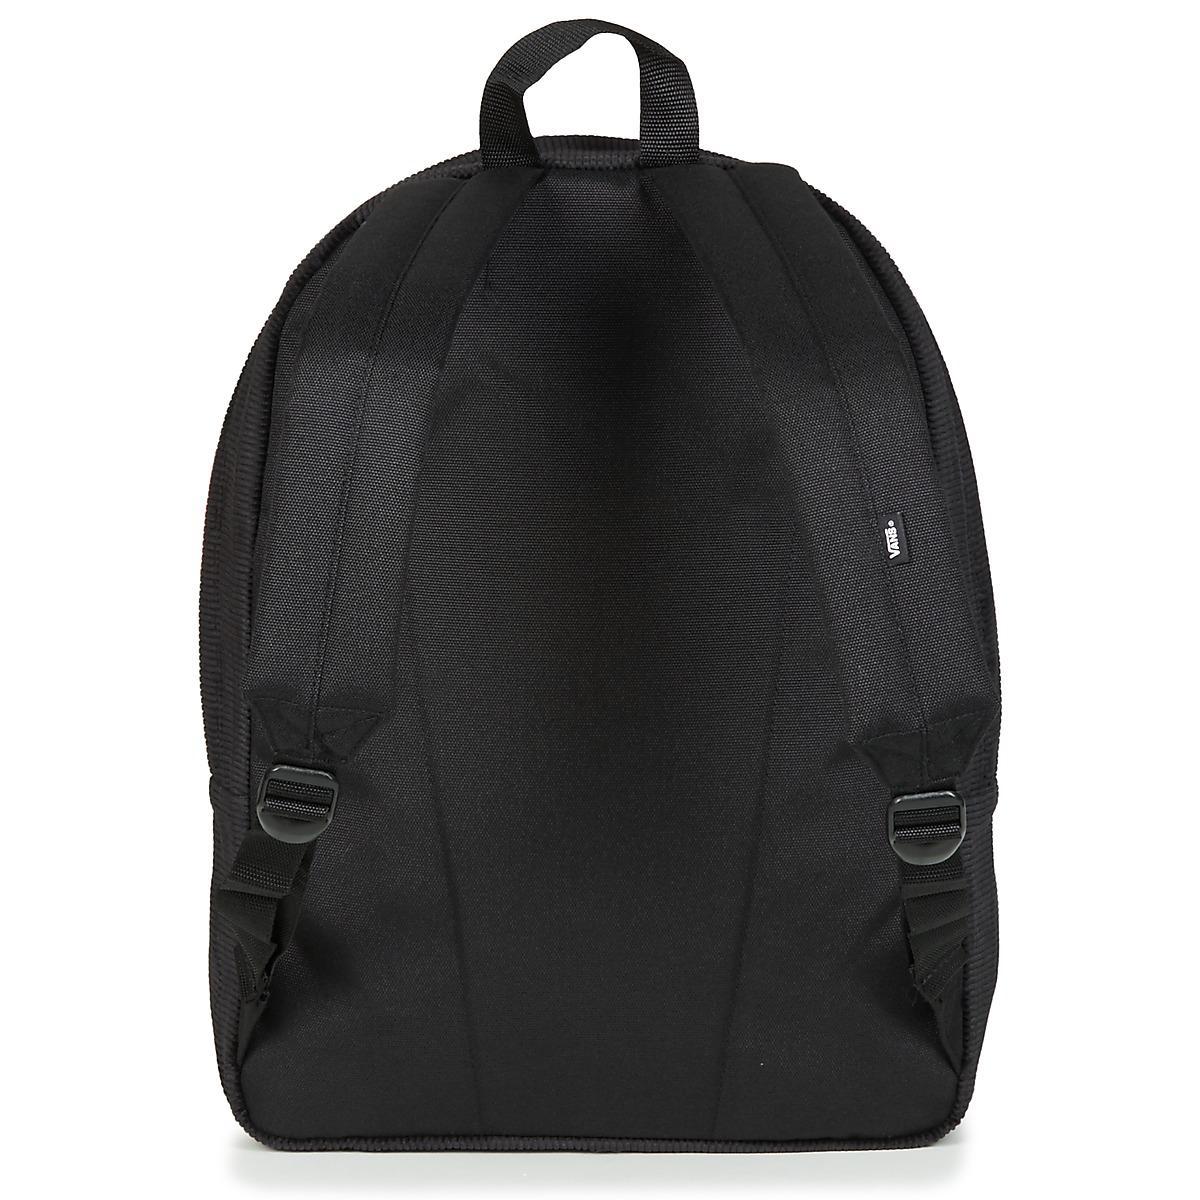 78fec92bb4 Vans - Old Skool Ii Backpack Women s Backpack In Black for Men - Lyst. View  fullscreen